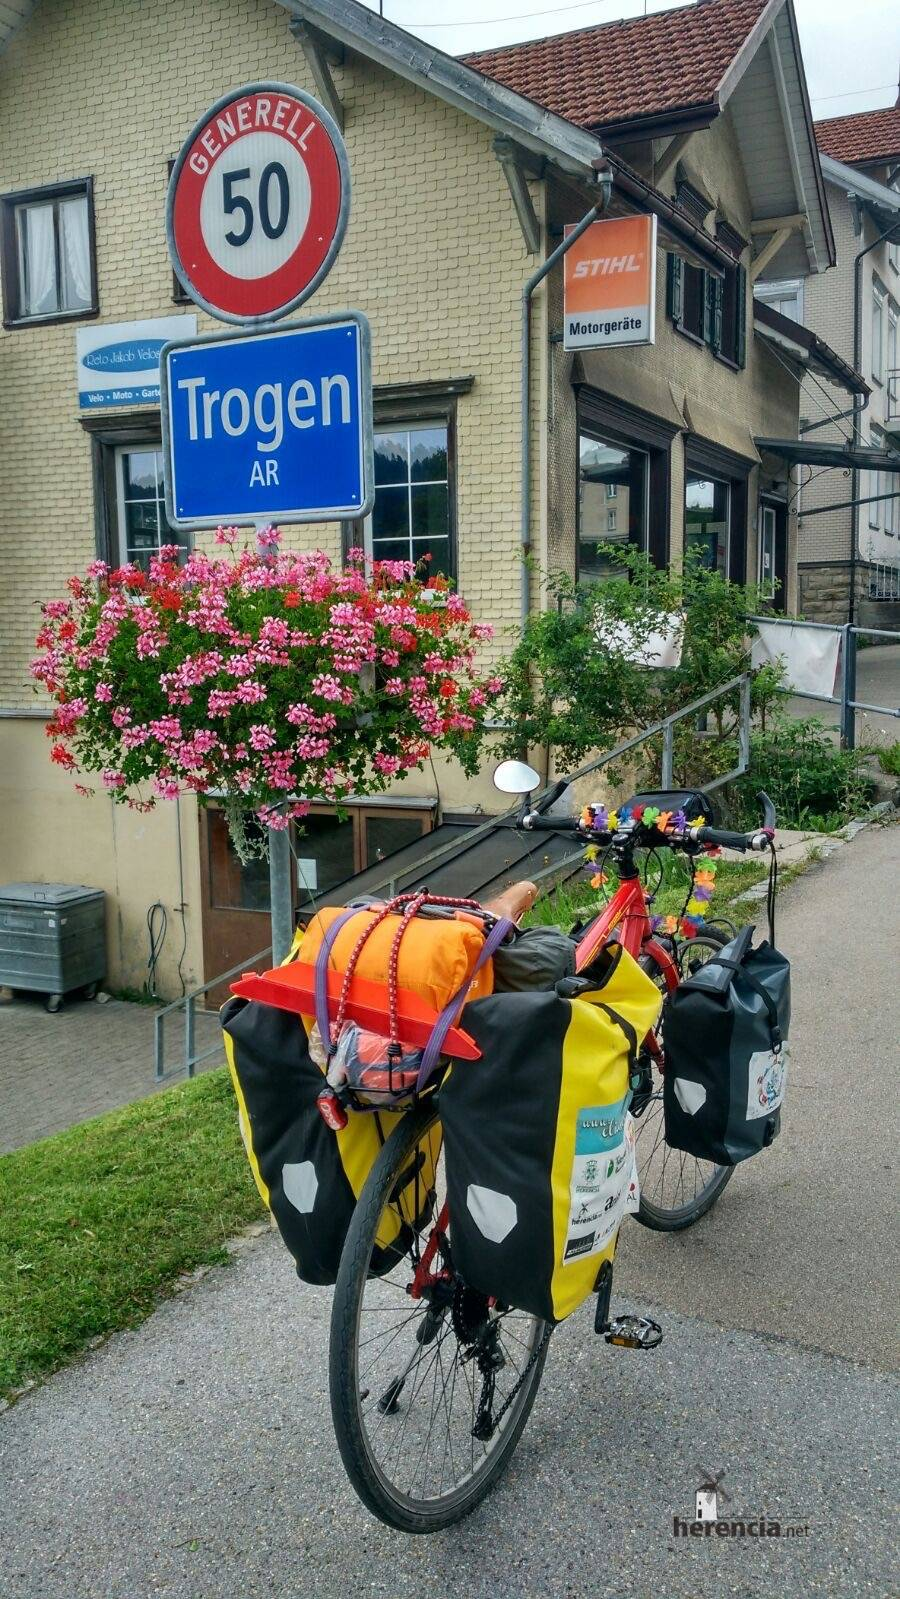 Etapa 33 Perlé en Austria06